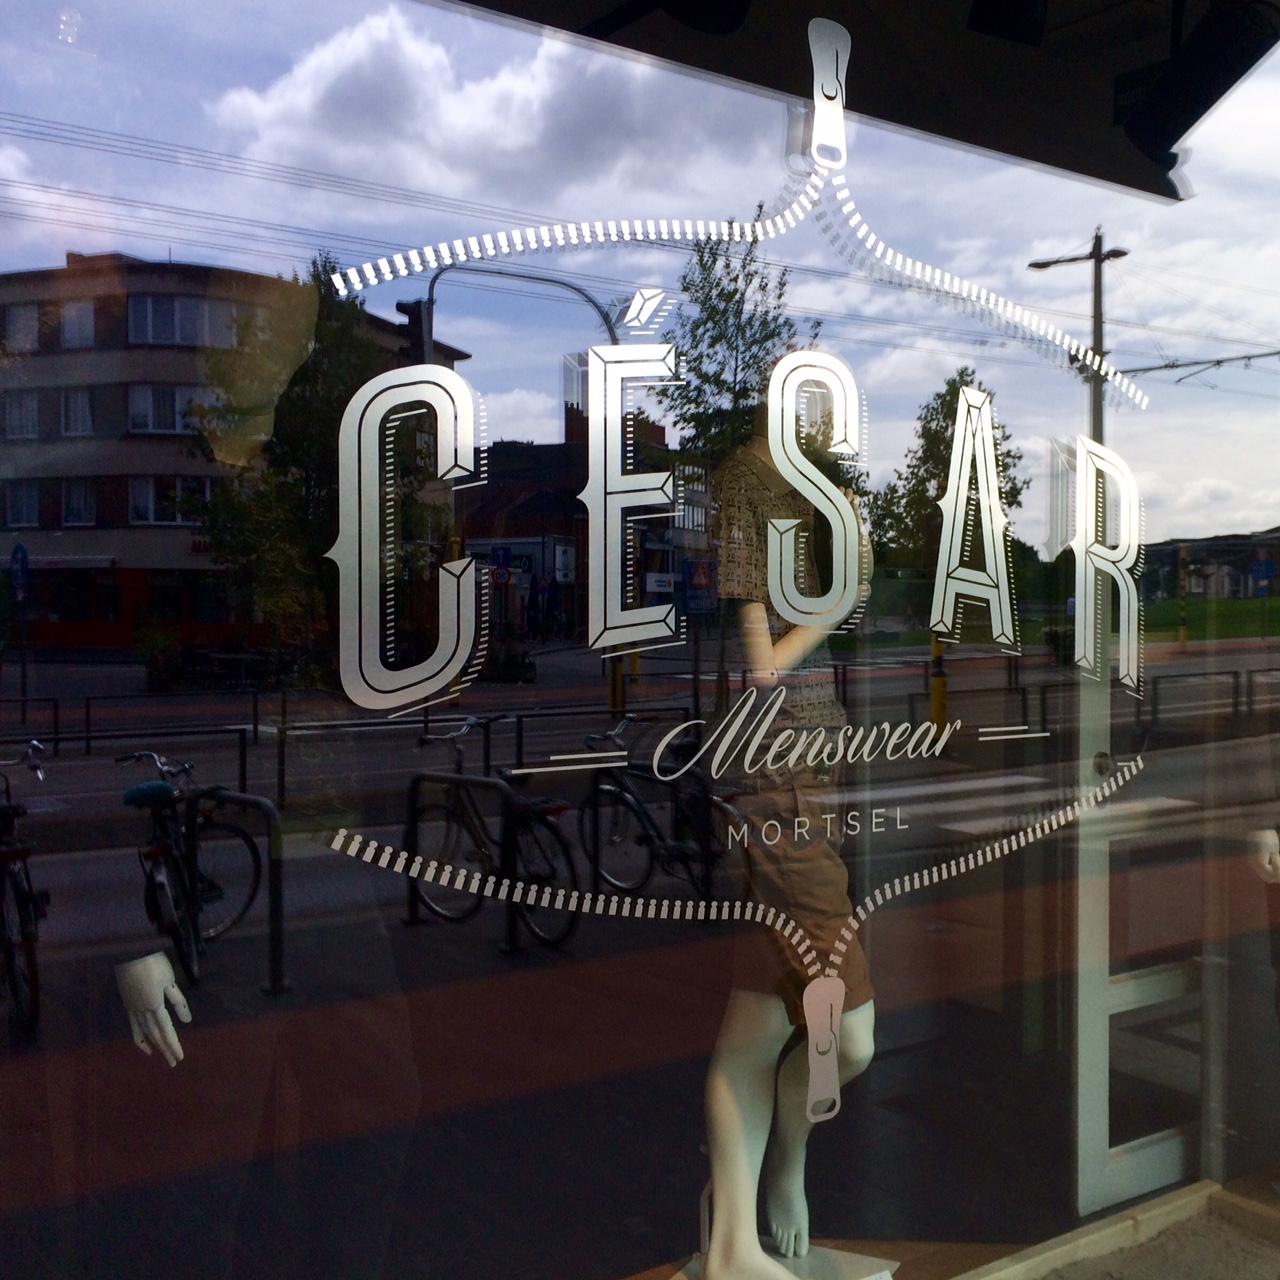 MORTSEL - CESAR MENSWEARStatielei 1312640 Mortselwww.cesarmenswear.beOpen monday - saturday (10:00 - 18:00)Closed on sunday